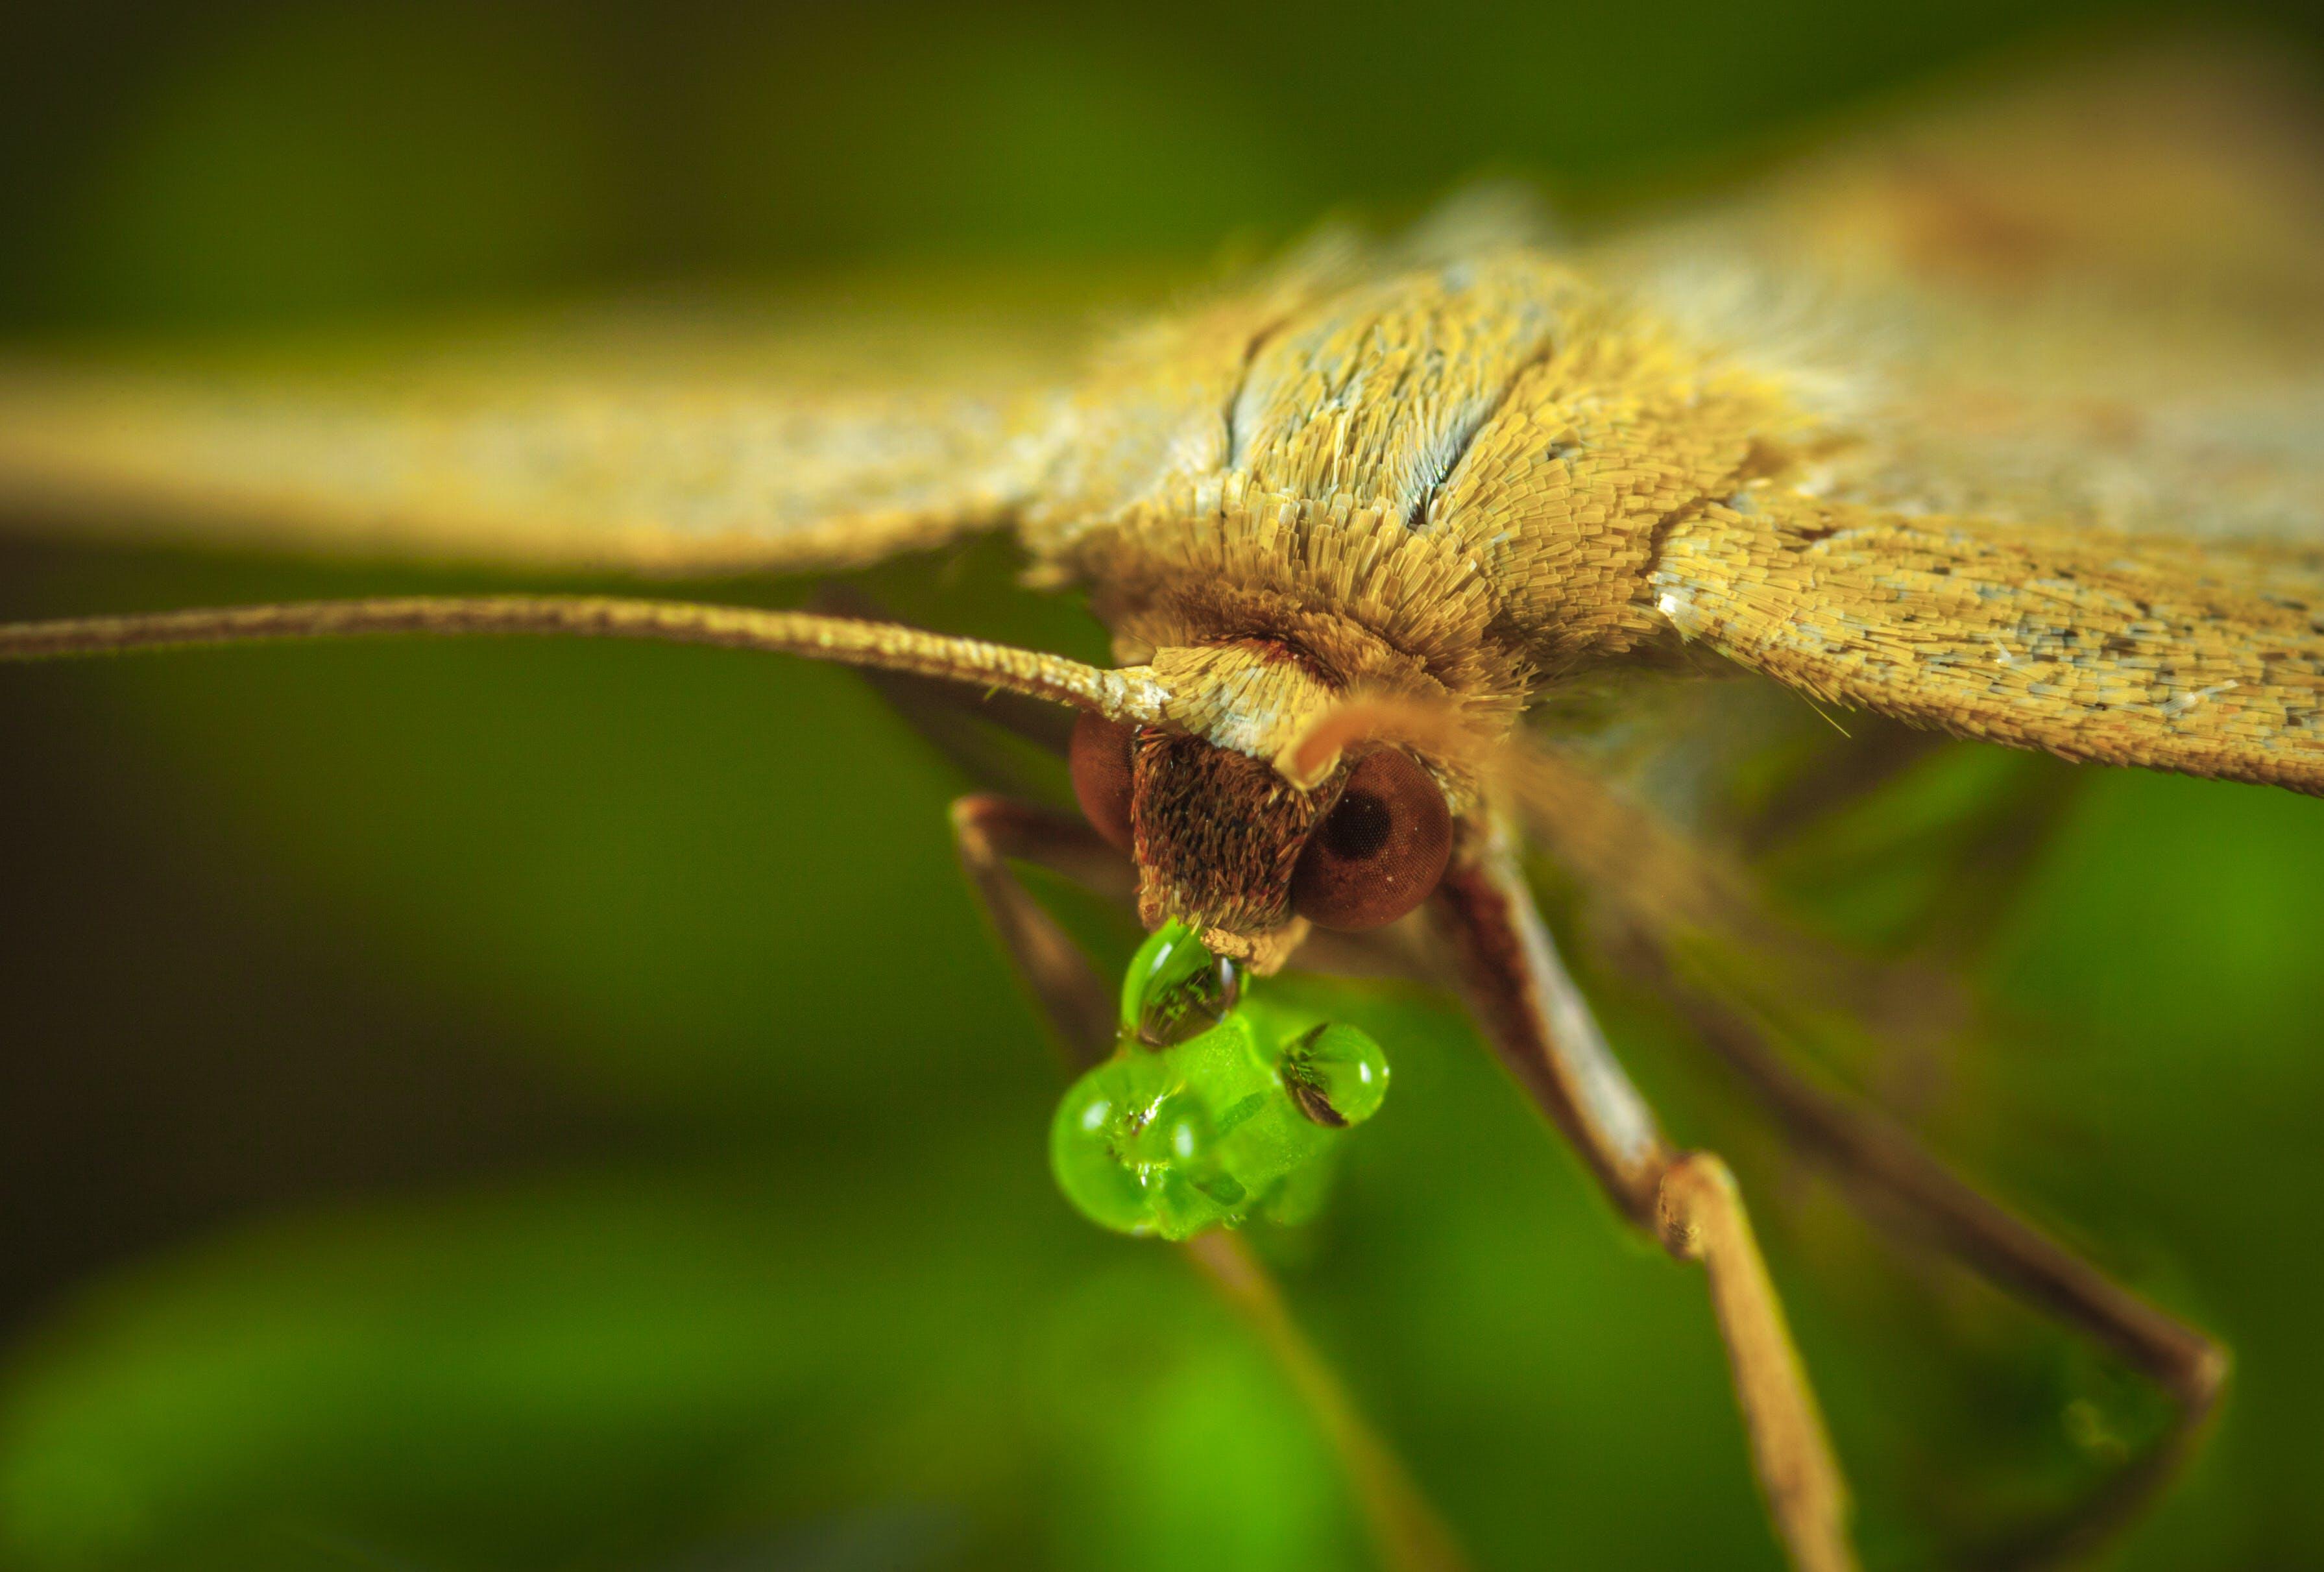 biologie, entomologie, farbe